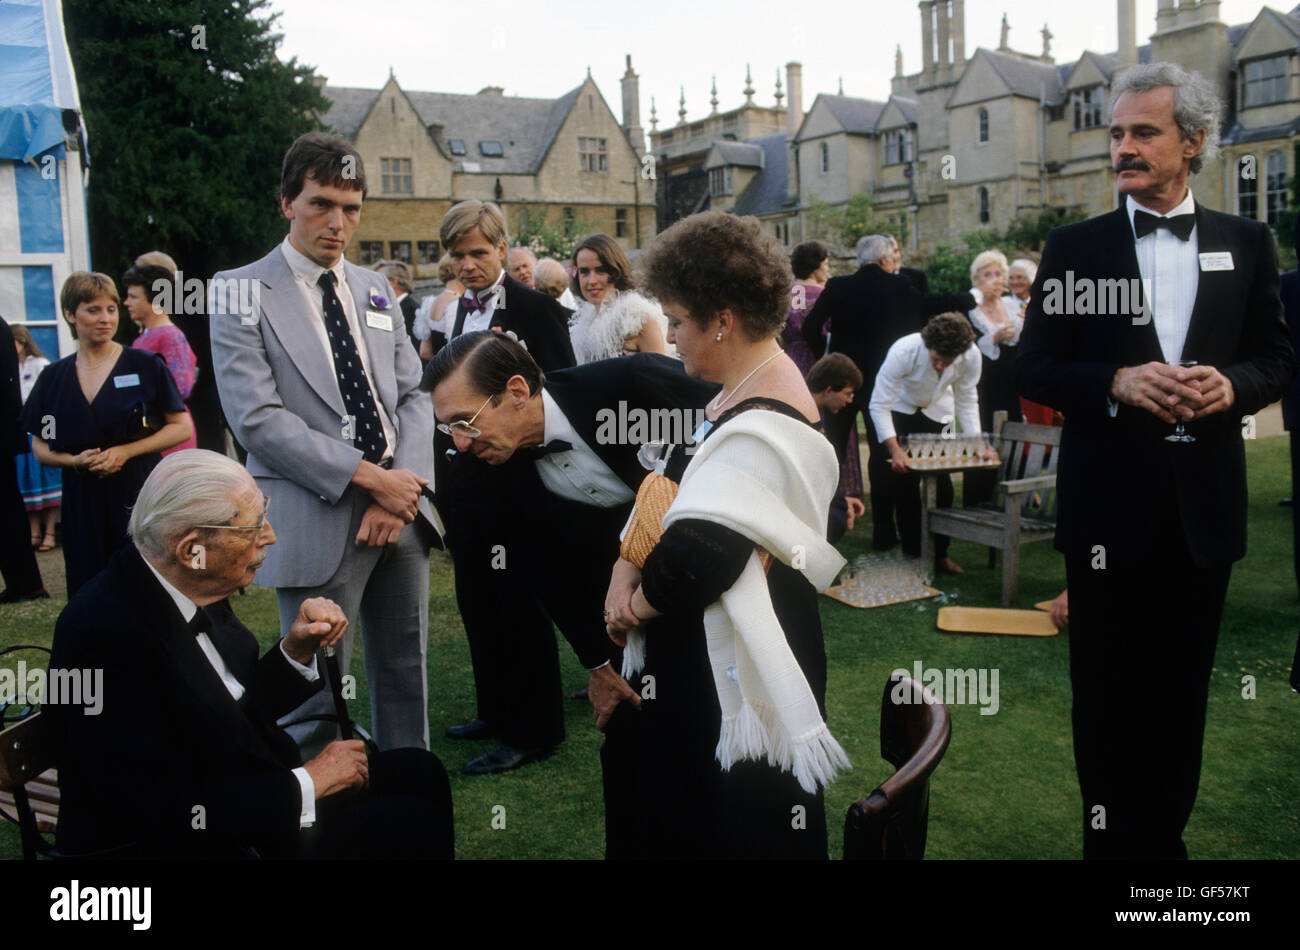 Harold Macmillan Ist 'Earl of Stockton'   Oxford university garden party HOMER SYKES - Stock Image